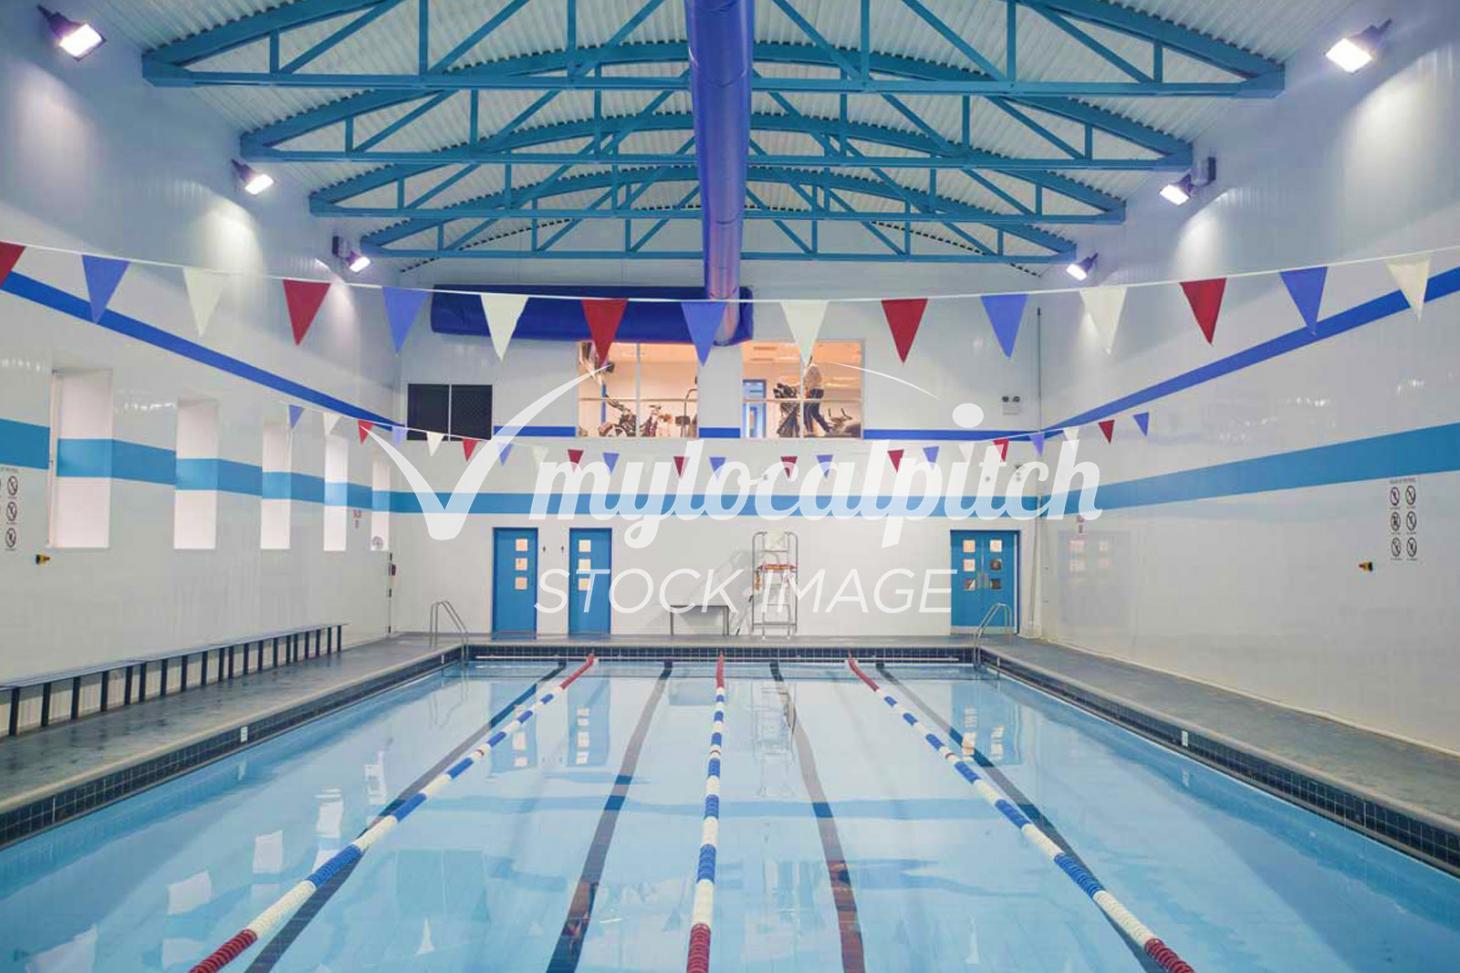 Teddington Pools & Fitness Centre Indoor swimming pool